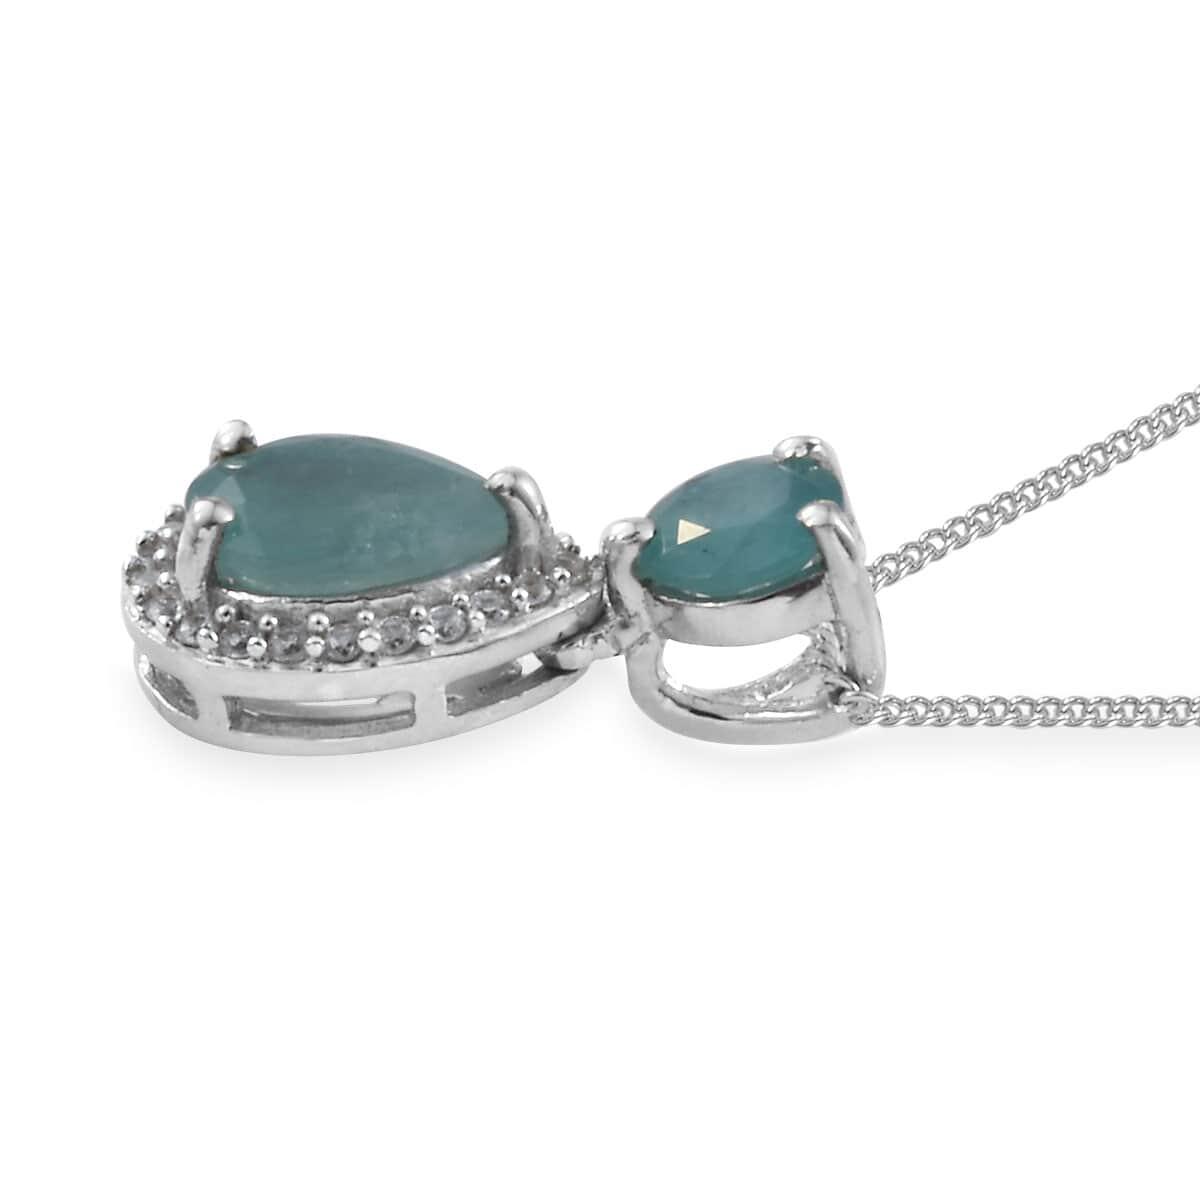 Grandidierite, Cambodian Zircon Pendant Necklace (20 in) in Platinum Over Sterling Silver 1.80 ctw